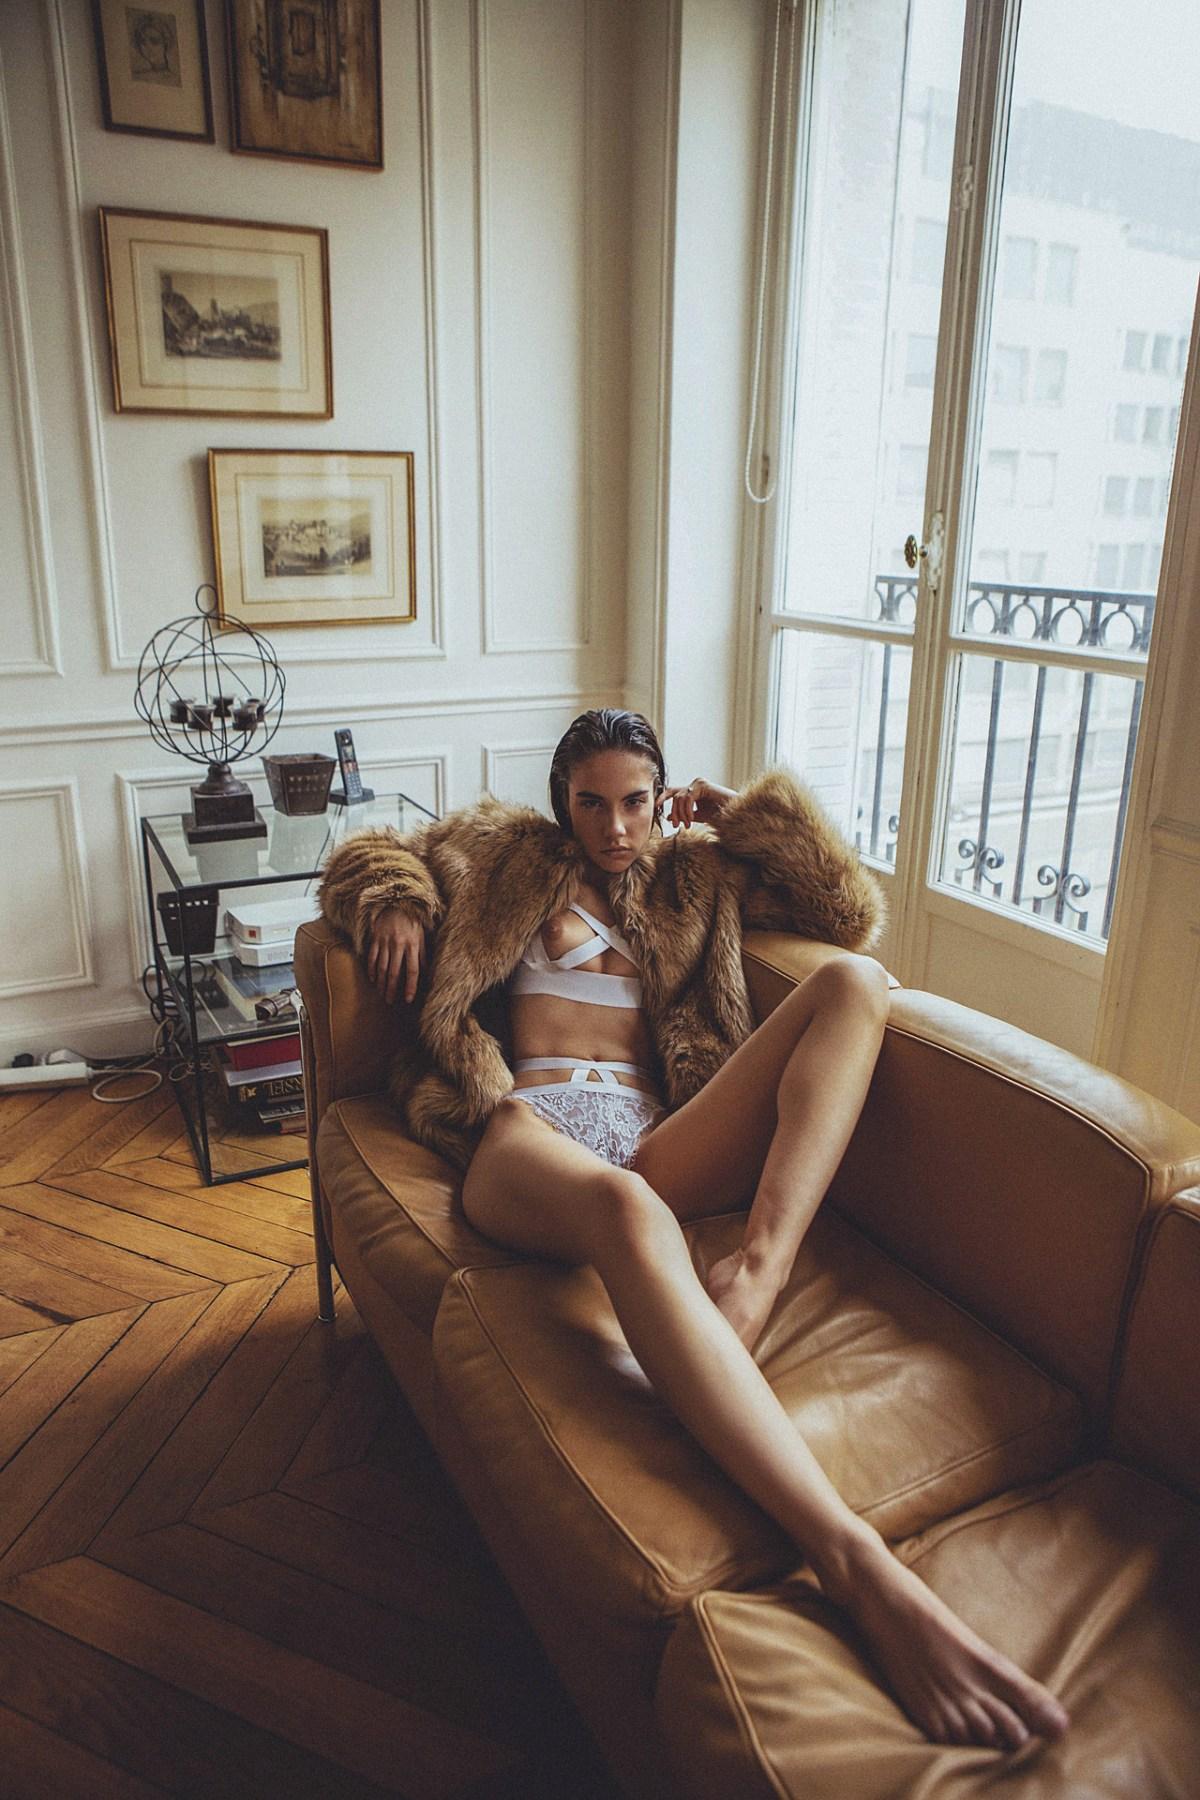 Rebecca Bagnol by Lili Eyes